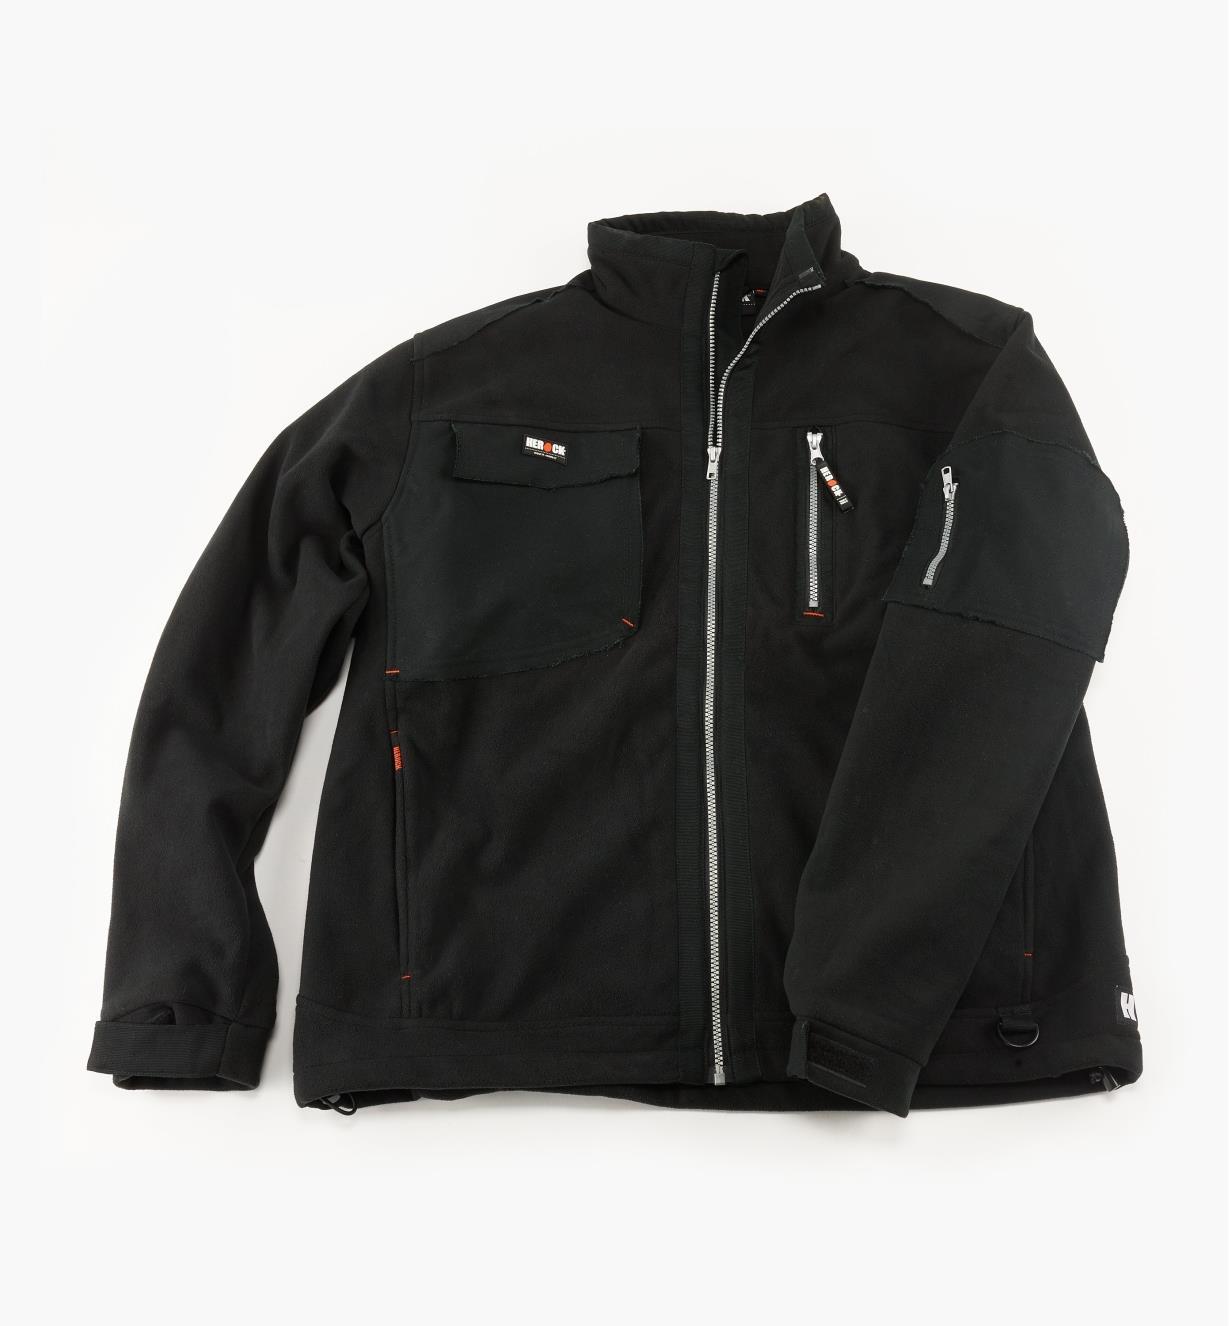 Herock Water-Resistant/Breathable Fleece Jacket, Black